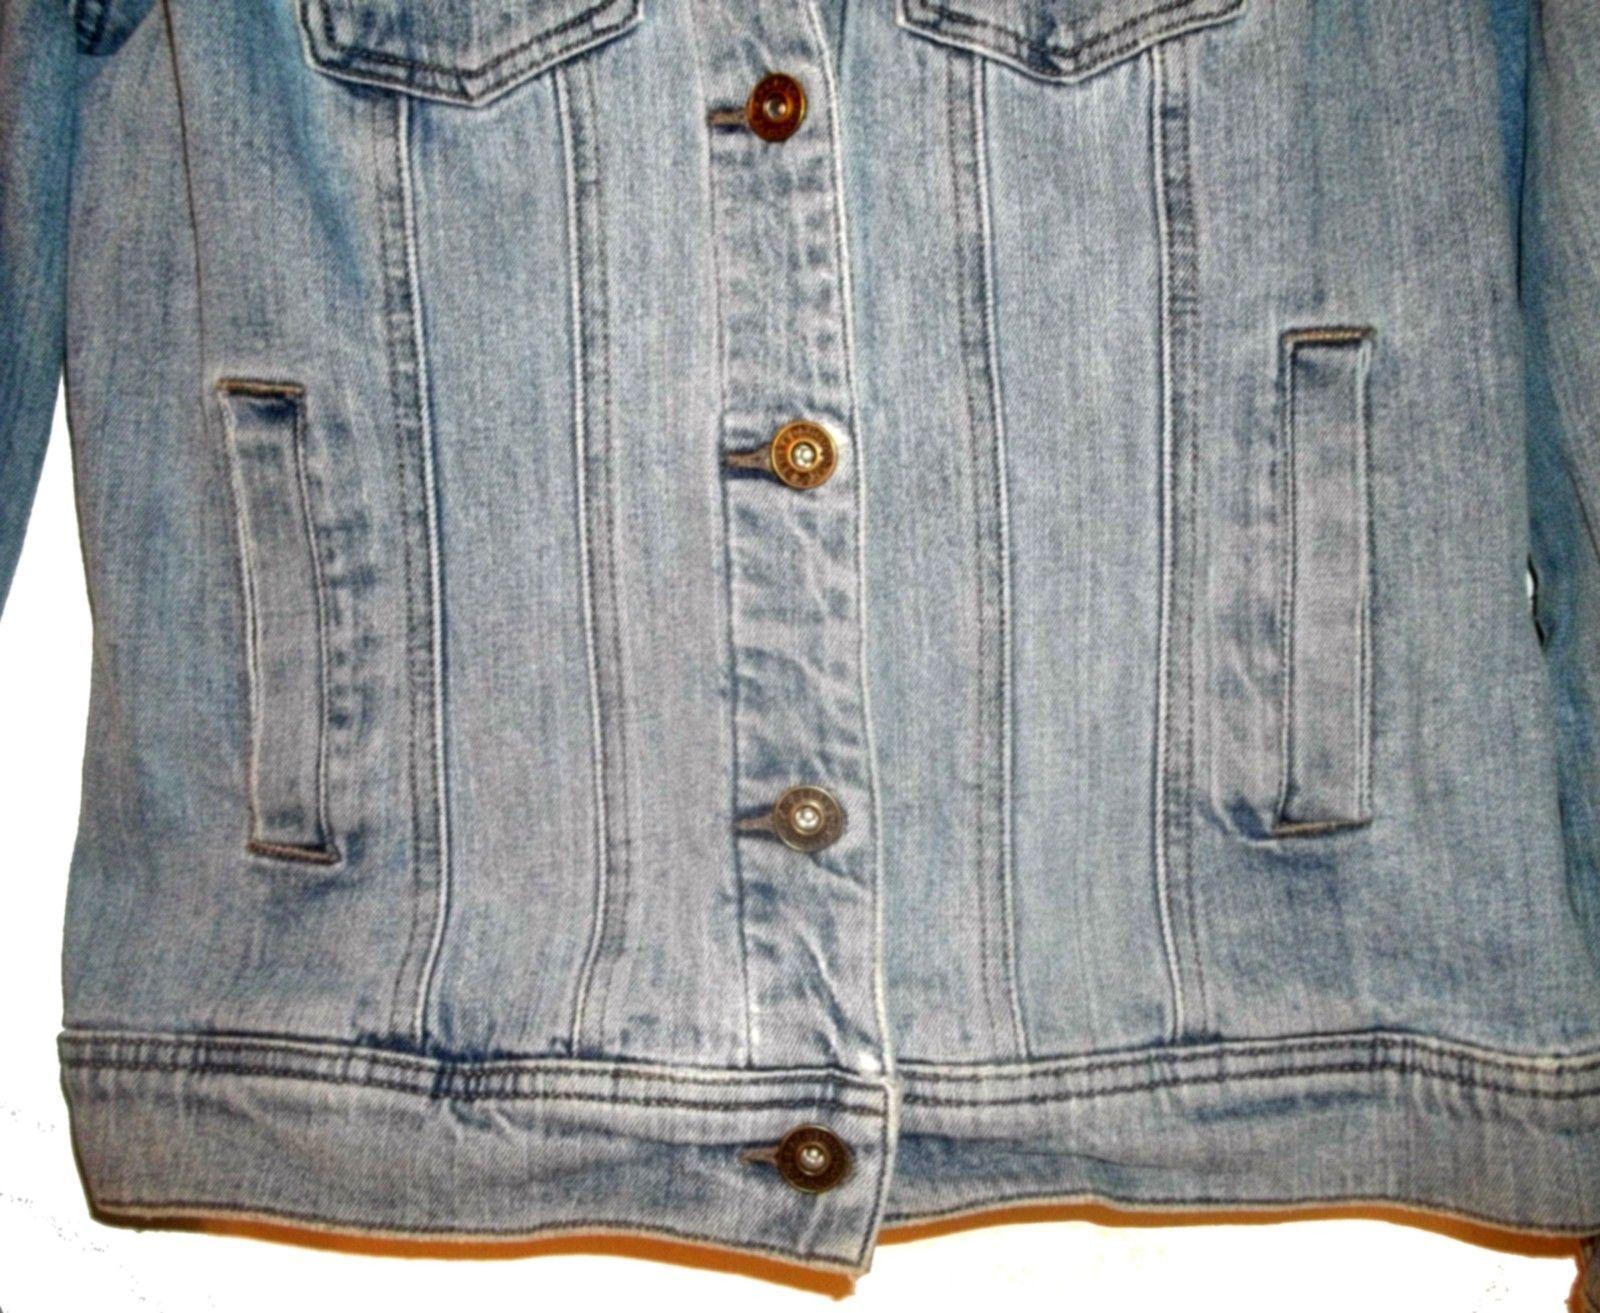 Sz S - Christopher & Banks Blue Jean Denim Jacket w/4 Front Pockets